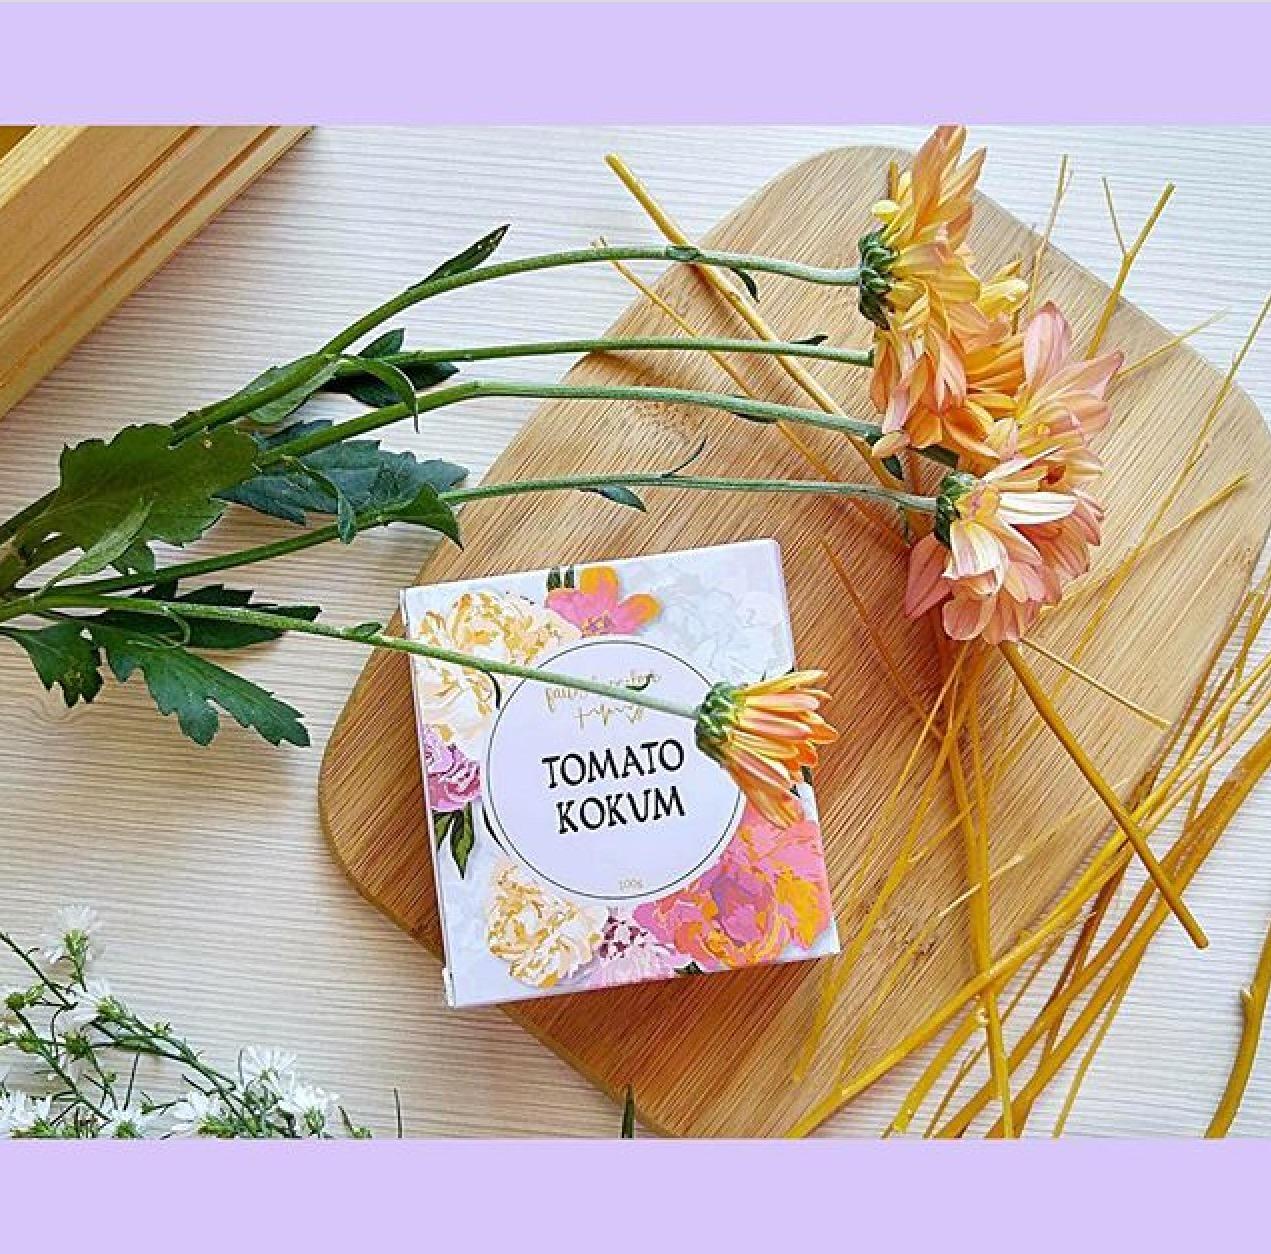 FaithHopeLove Local Vegan Skinfood Tomato Kokum pure glycerin soap